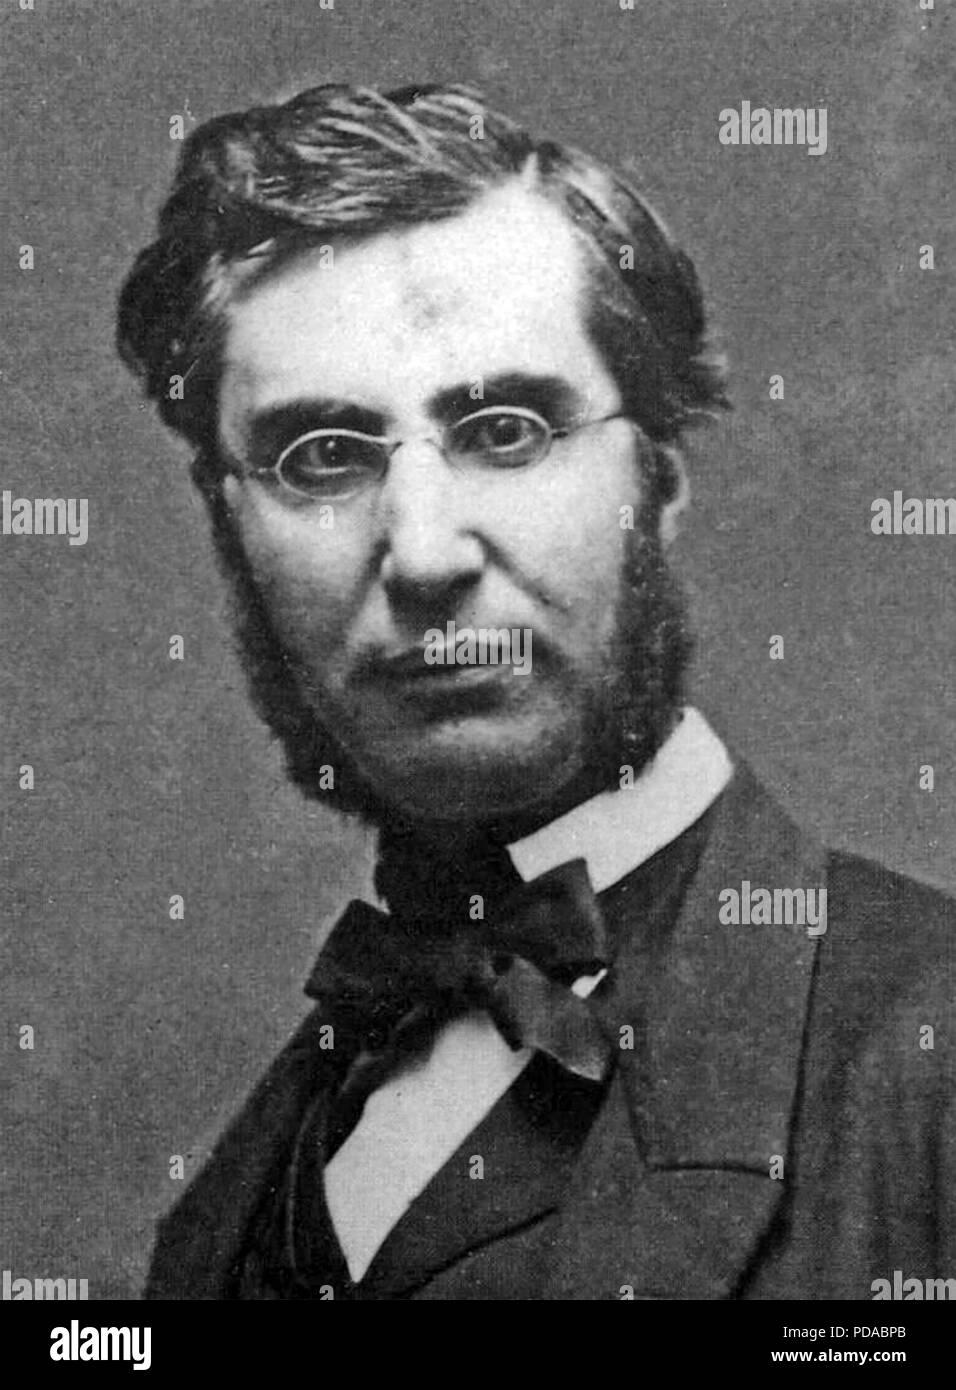 EMILE OLLIVIER (1825-1913) French statesman - Stock Image